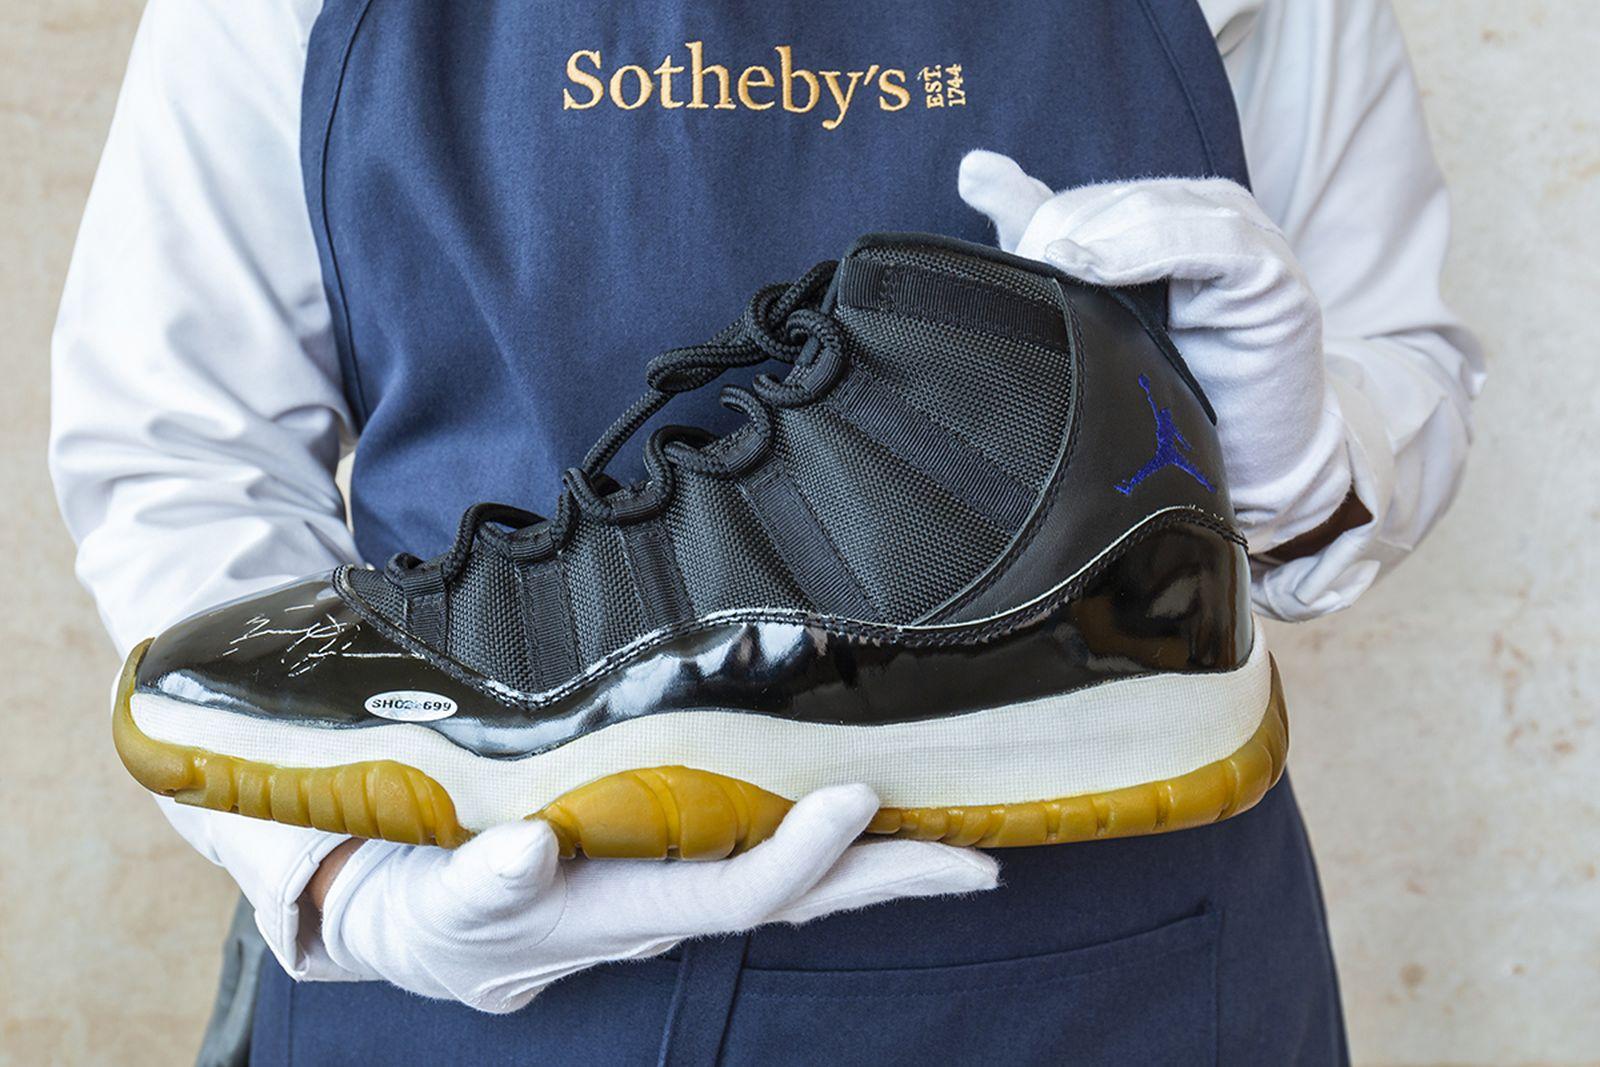 michael-jordan-air-jordan-11-space-jam-auction-sothebys-03